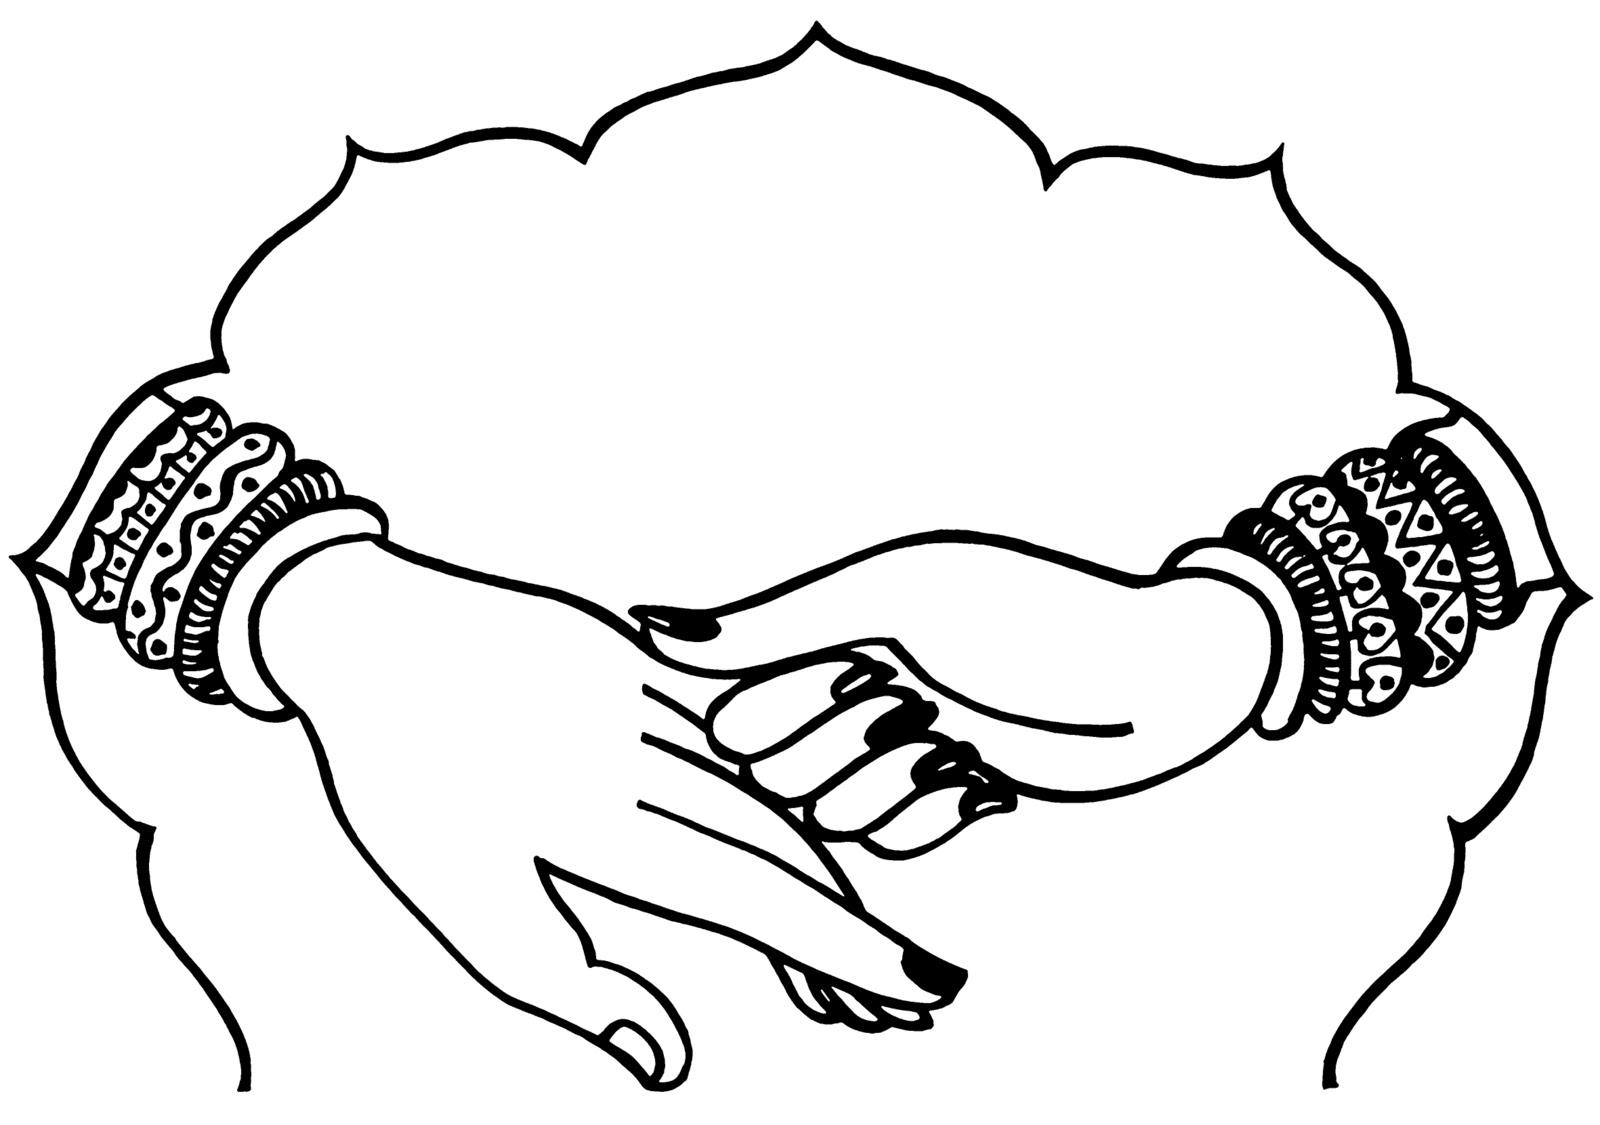 hight resolution of 1600x1125 wedding clipart hand